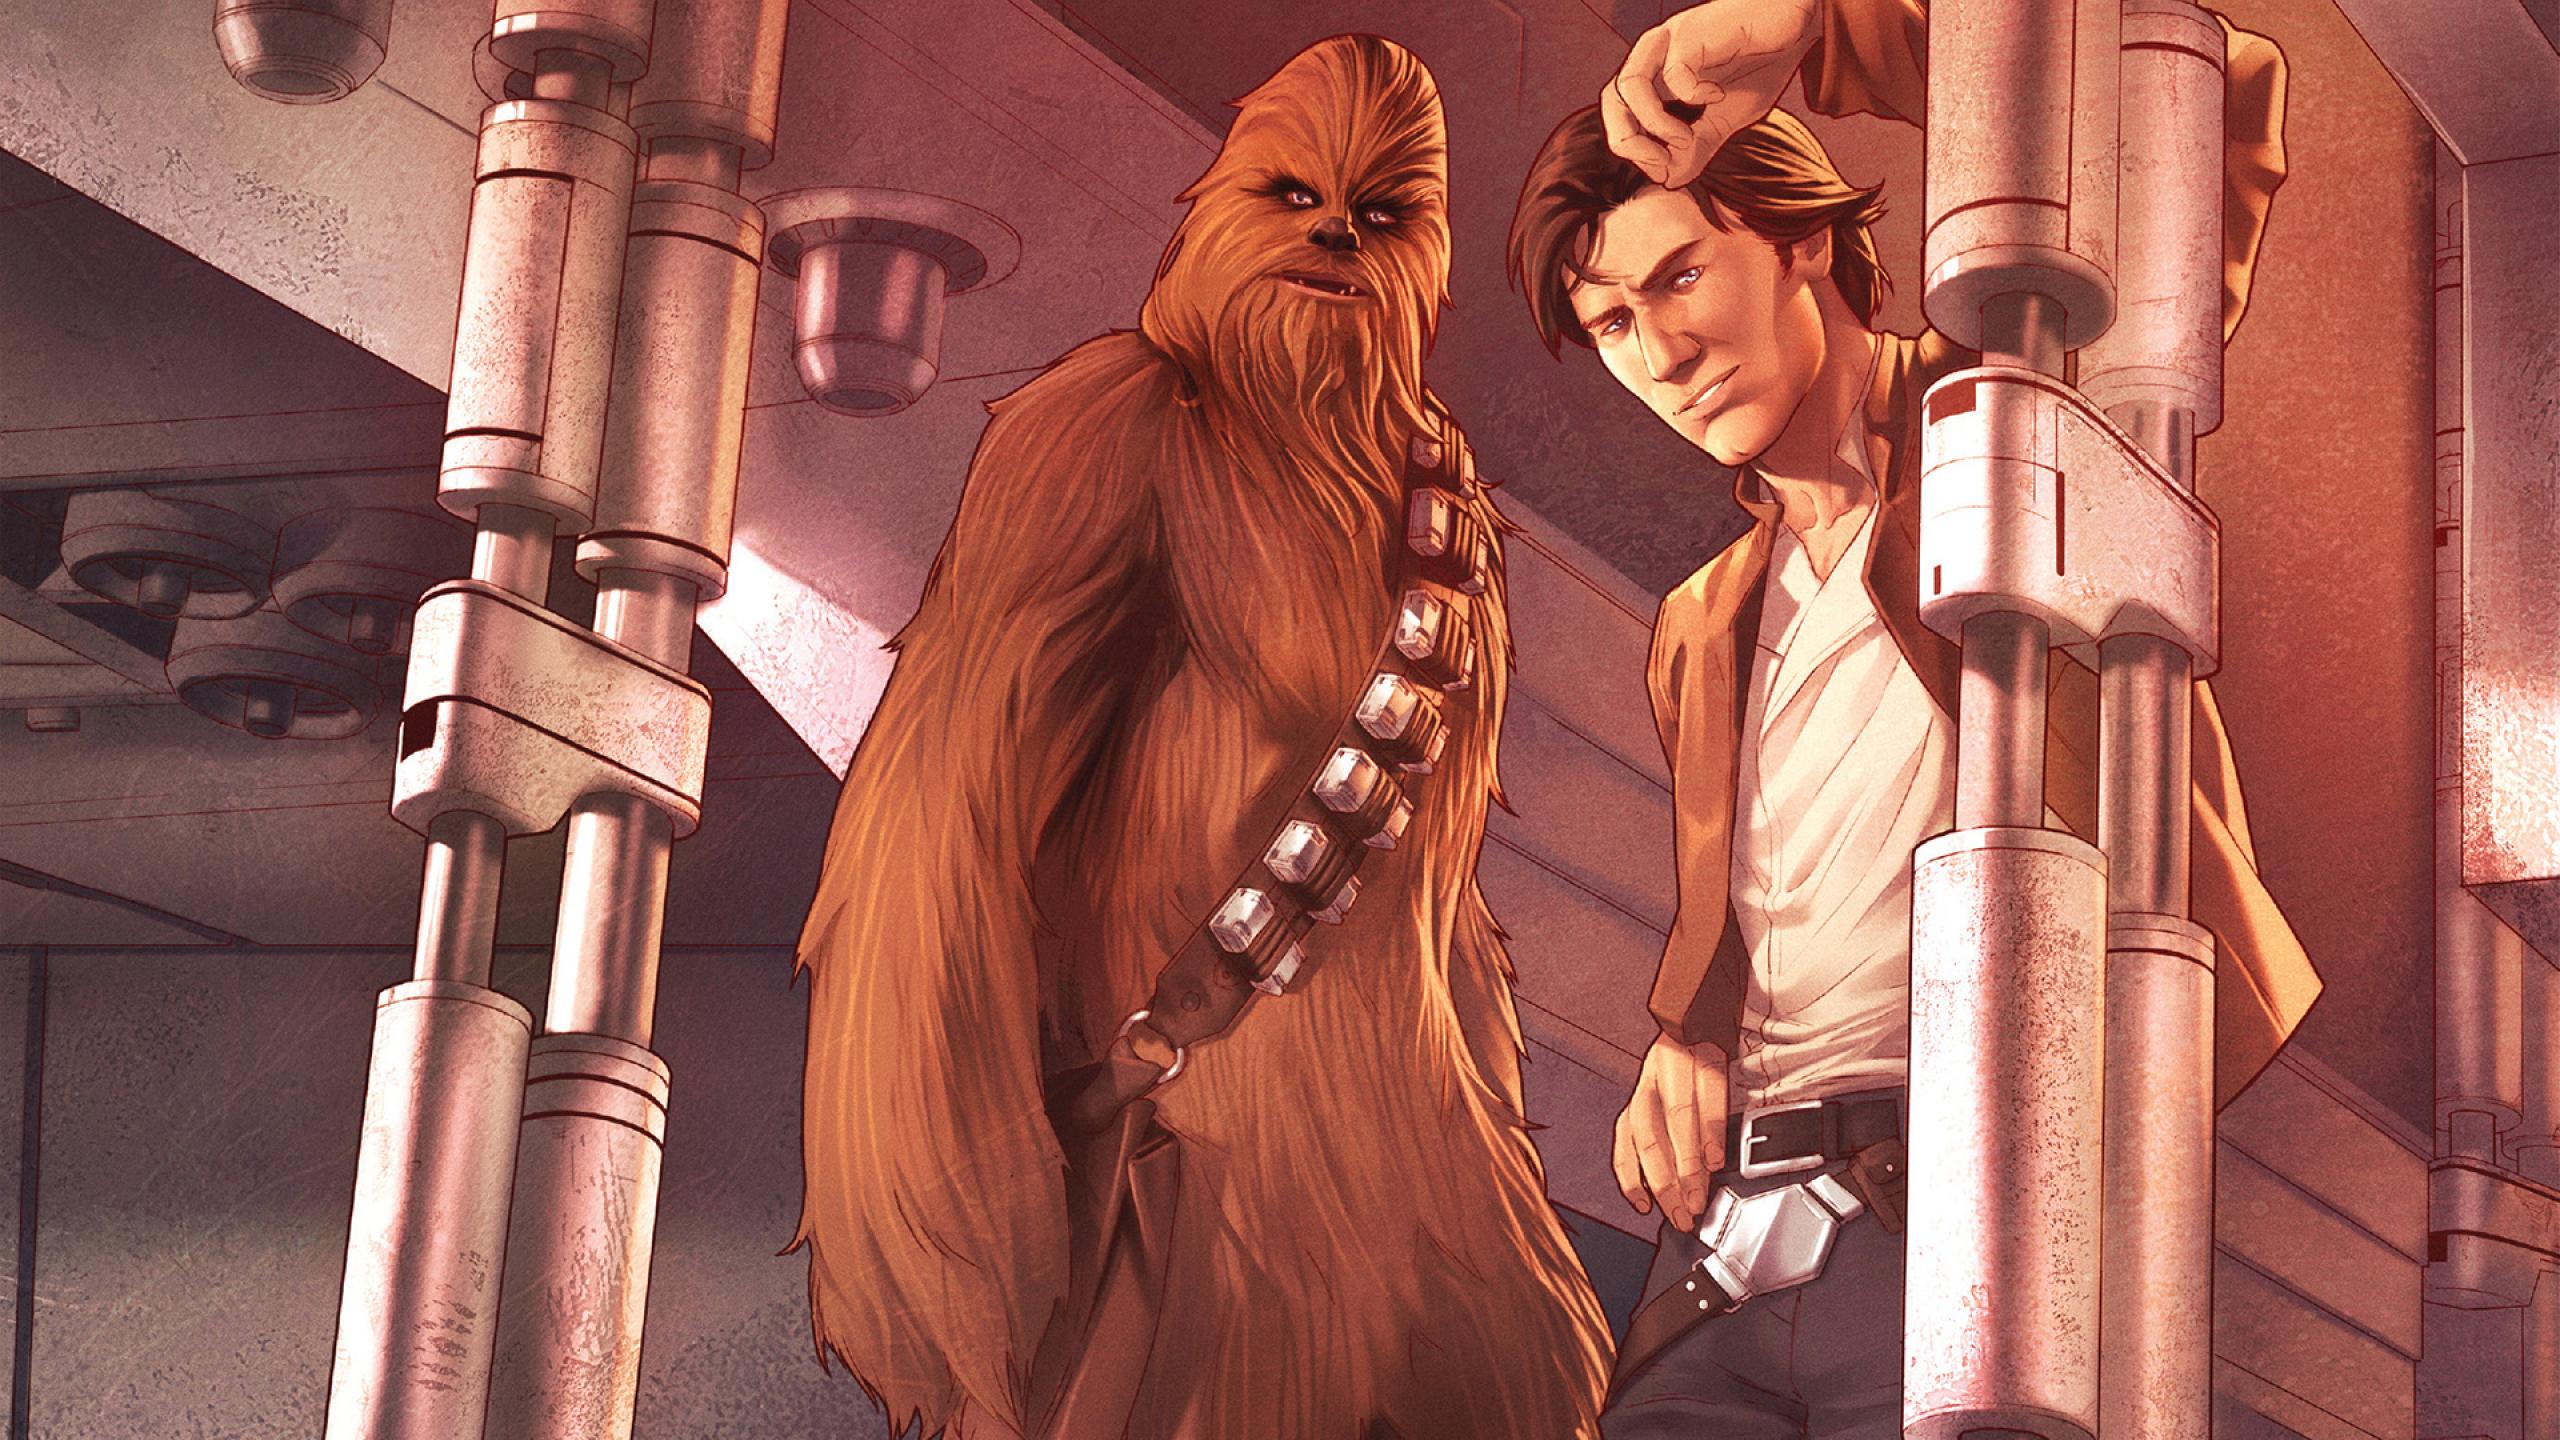 Star Wars Han Solo And Chewbacca, Full HD Wallpaper